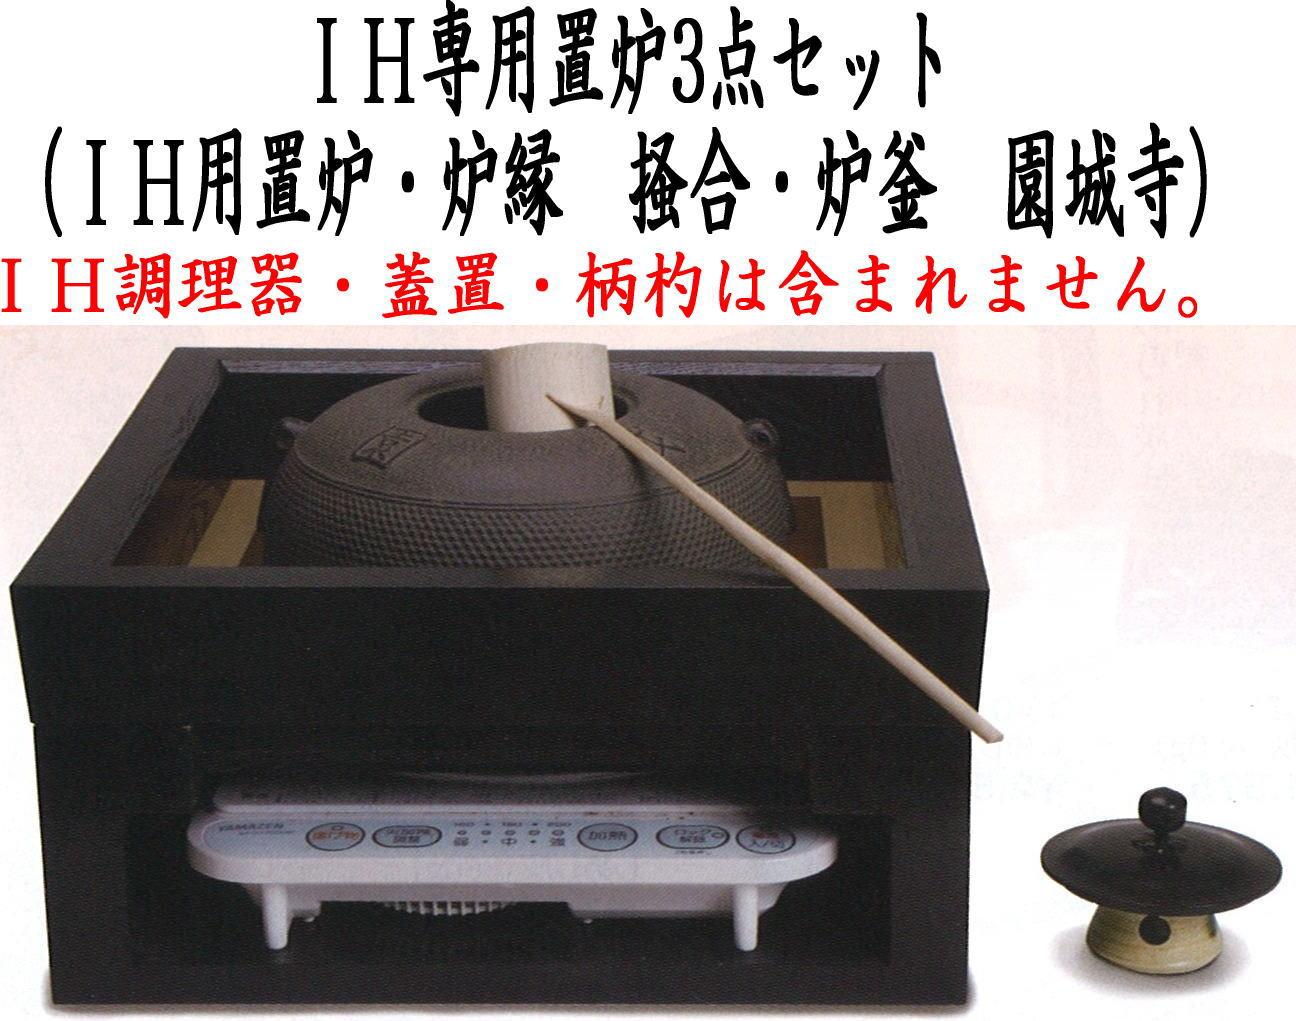 IH用掻合置炉と炉縁と炉釜セット (I H 調理器用は別売り)